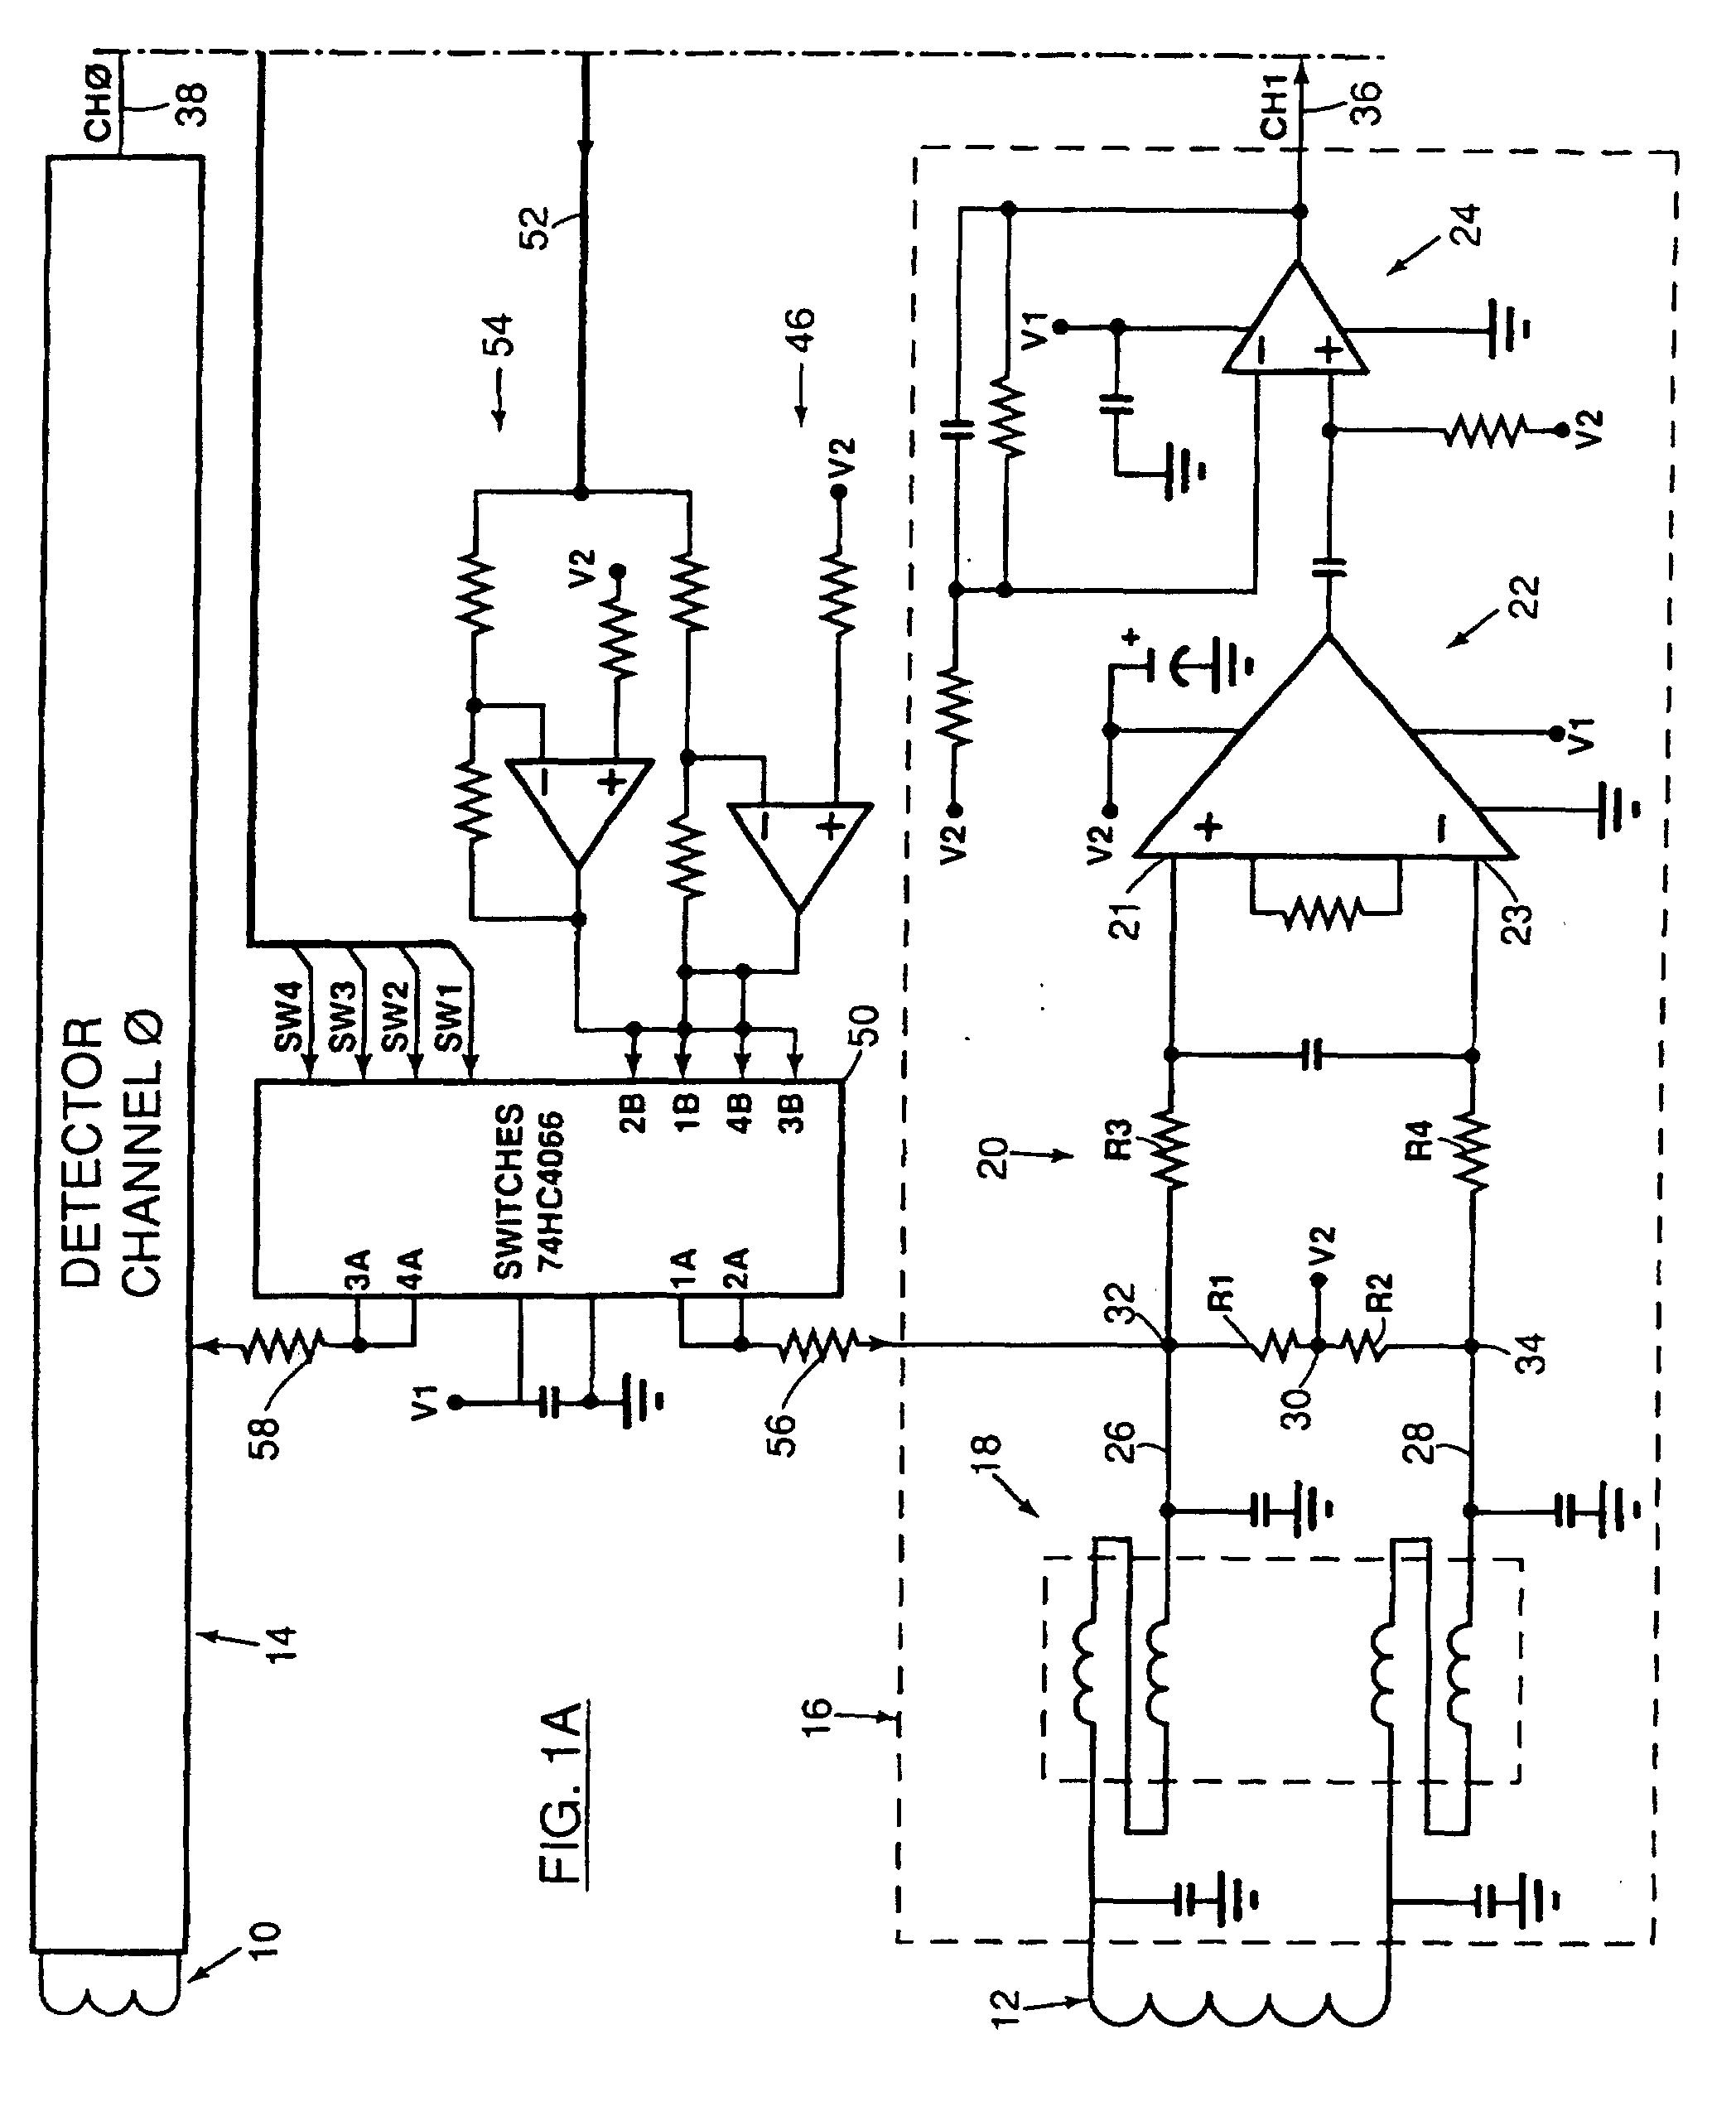 patent ep0735377b1